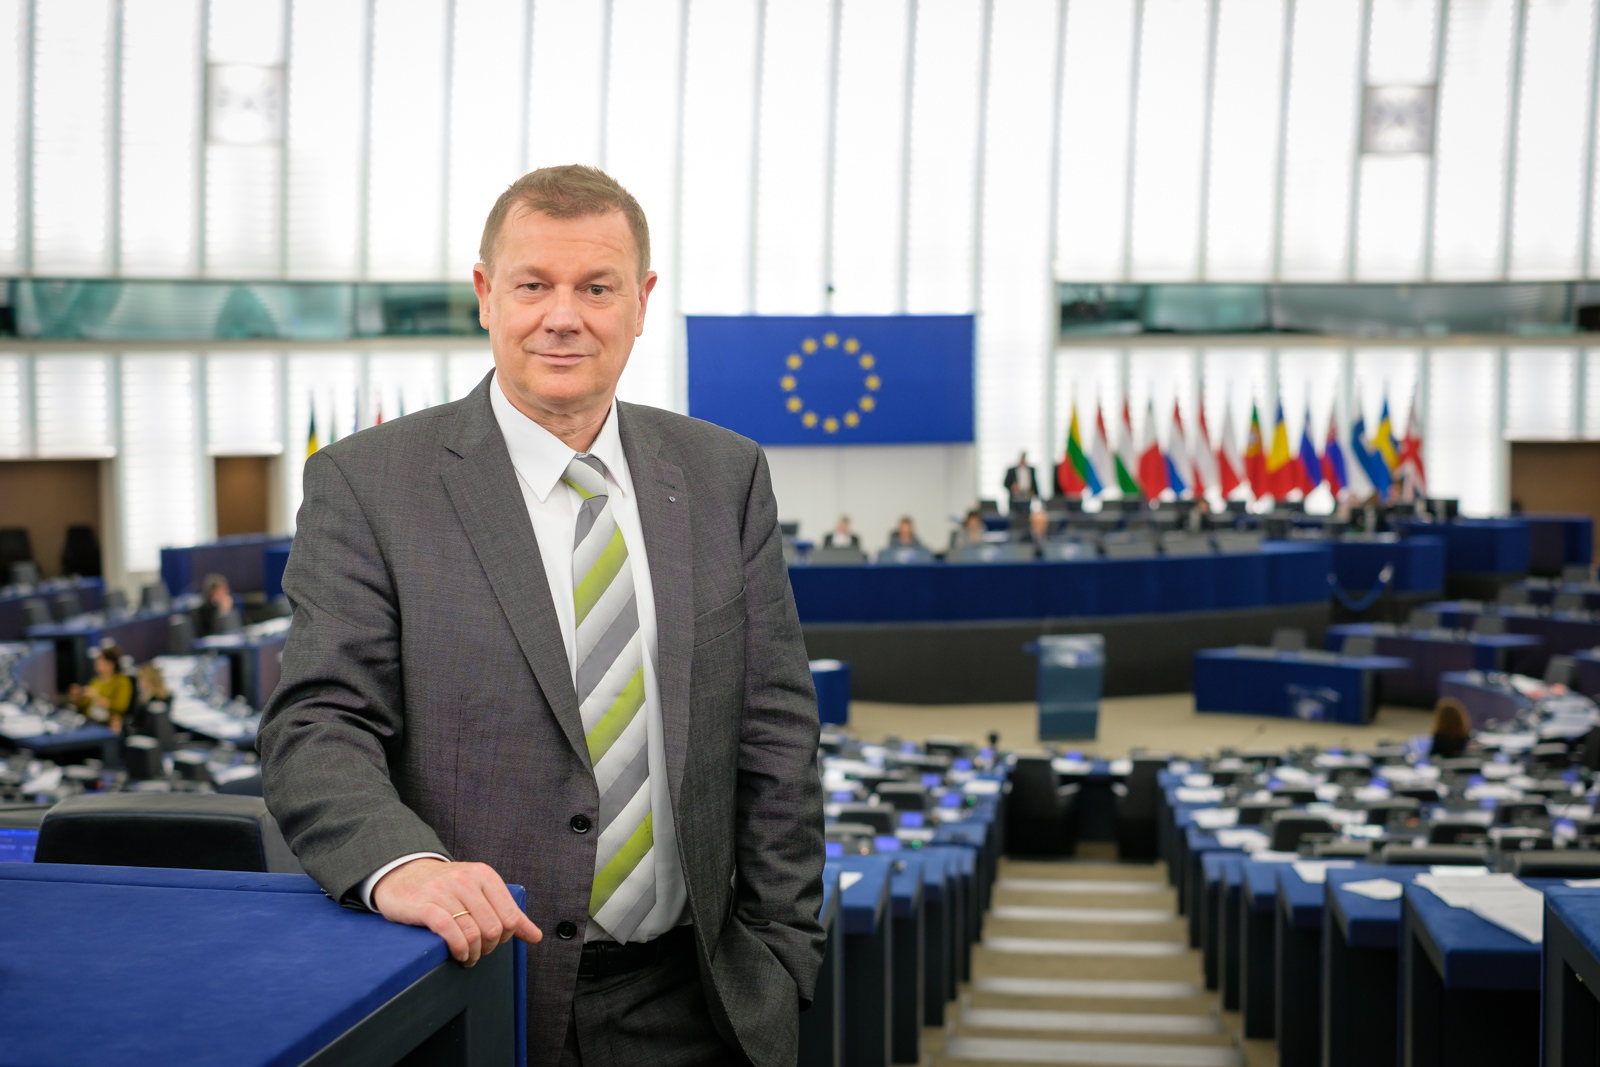 https://www.markus-pieper.eu/wp-content/uploads/2012/12/17-02-15-Pieper-portrait-Str-22.jpg